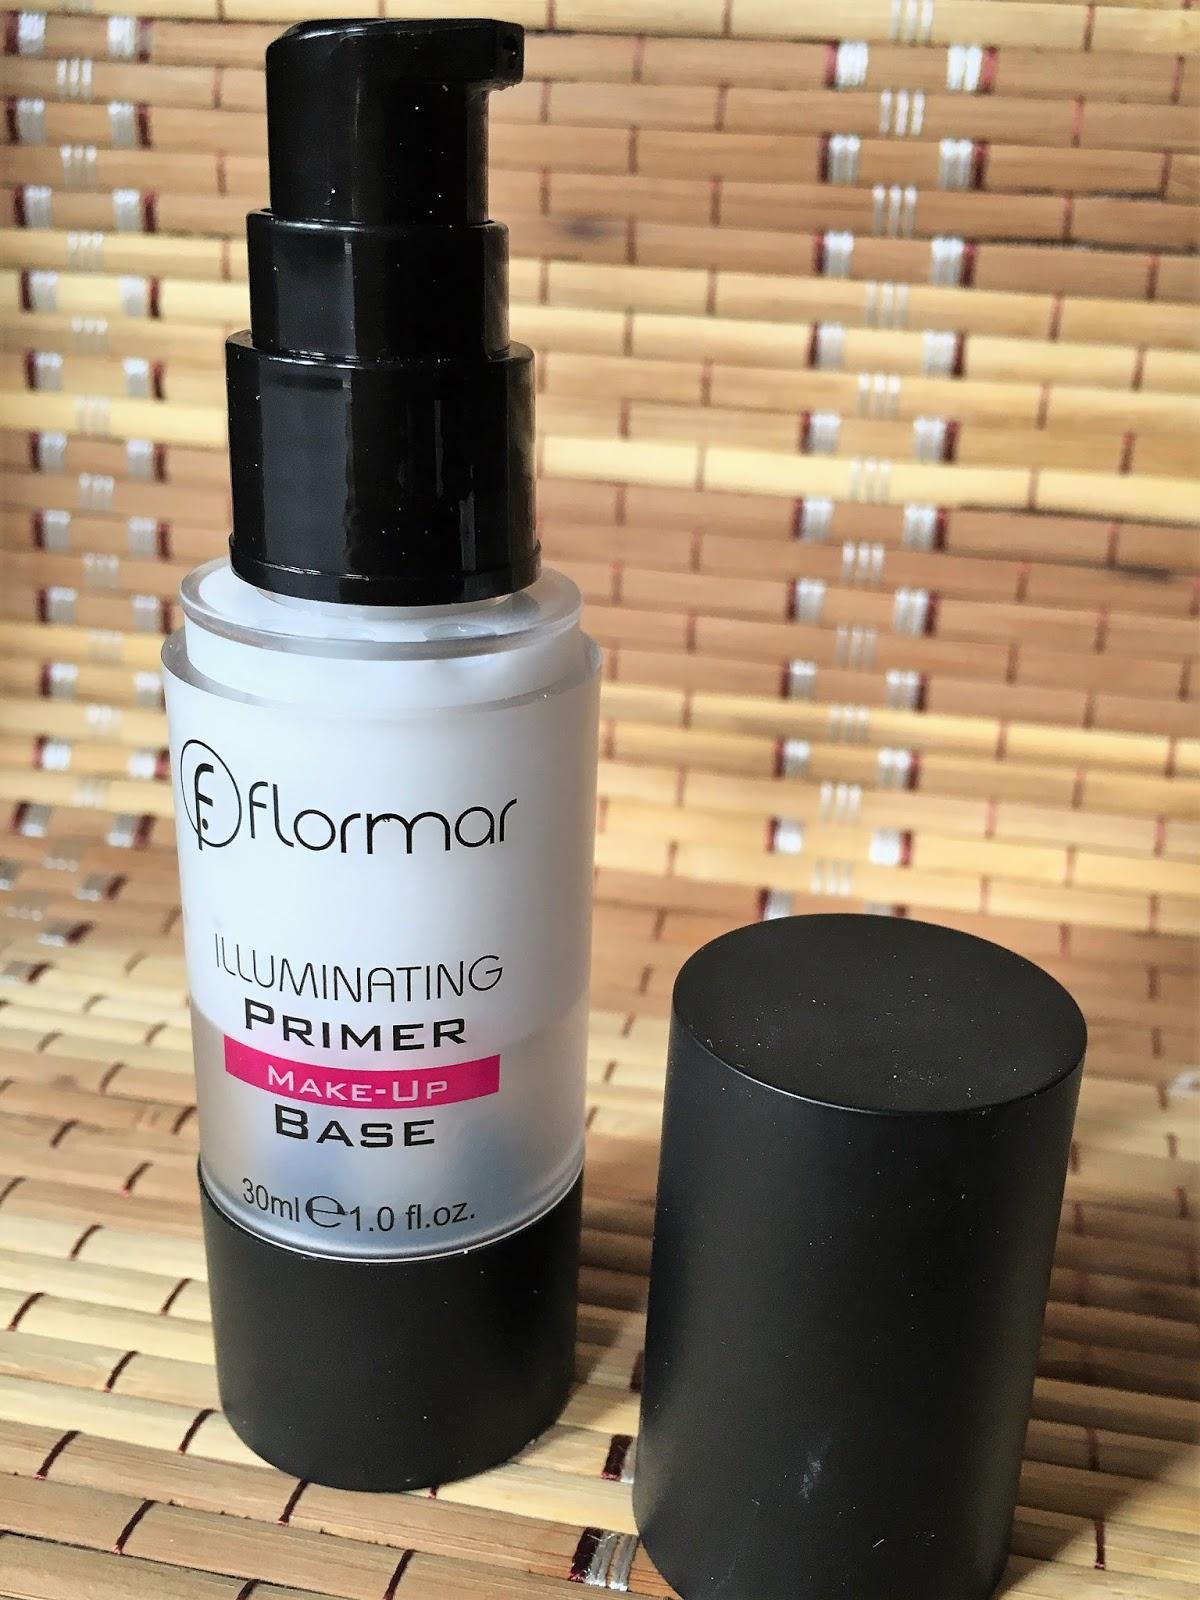 Flormar Illuminating Primer Make Up Base 30ml Daftar Harga